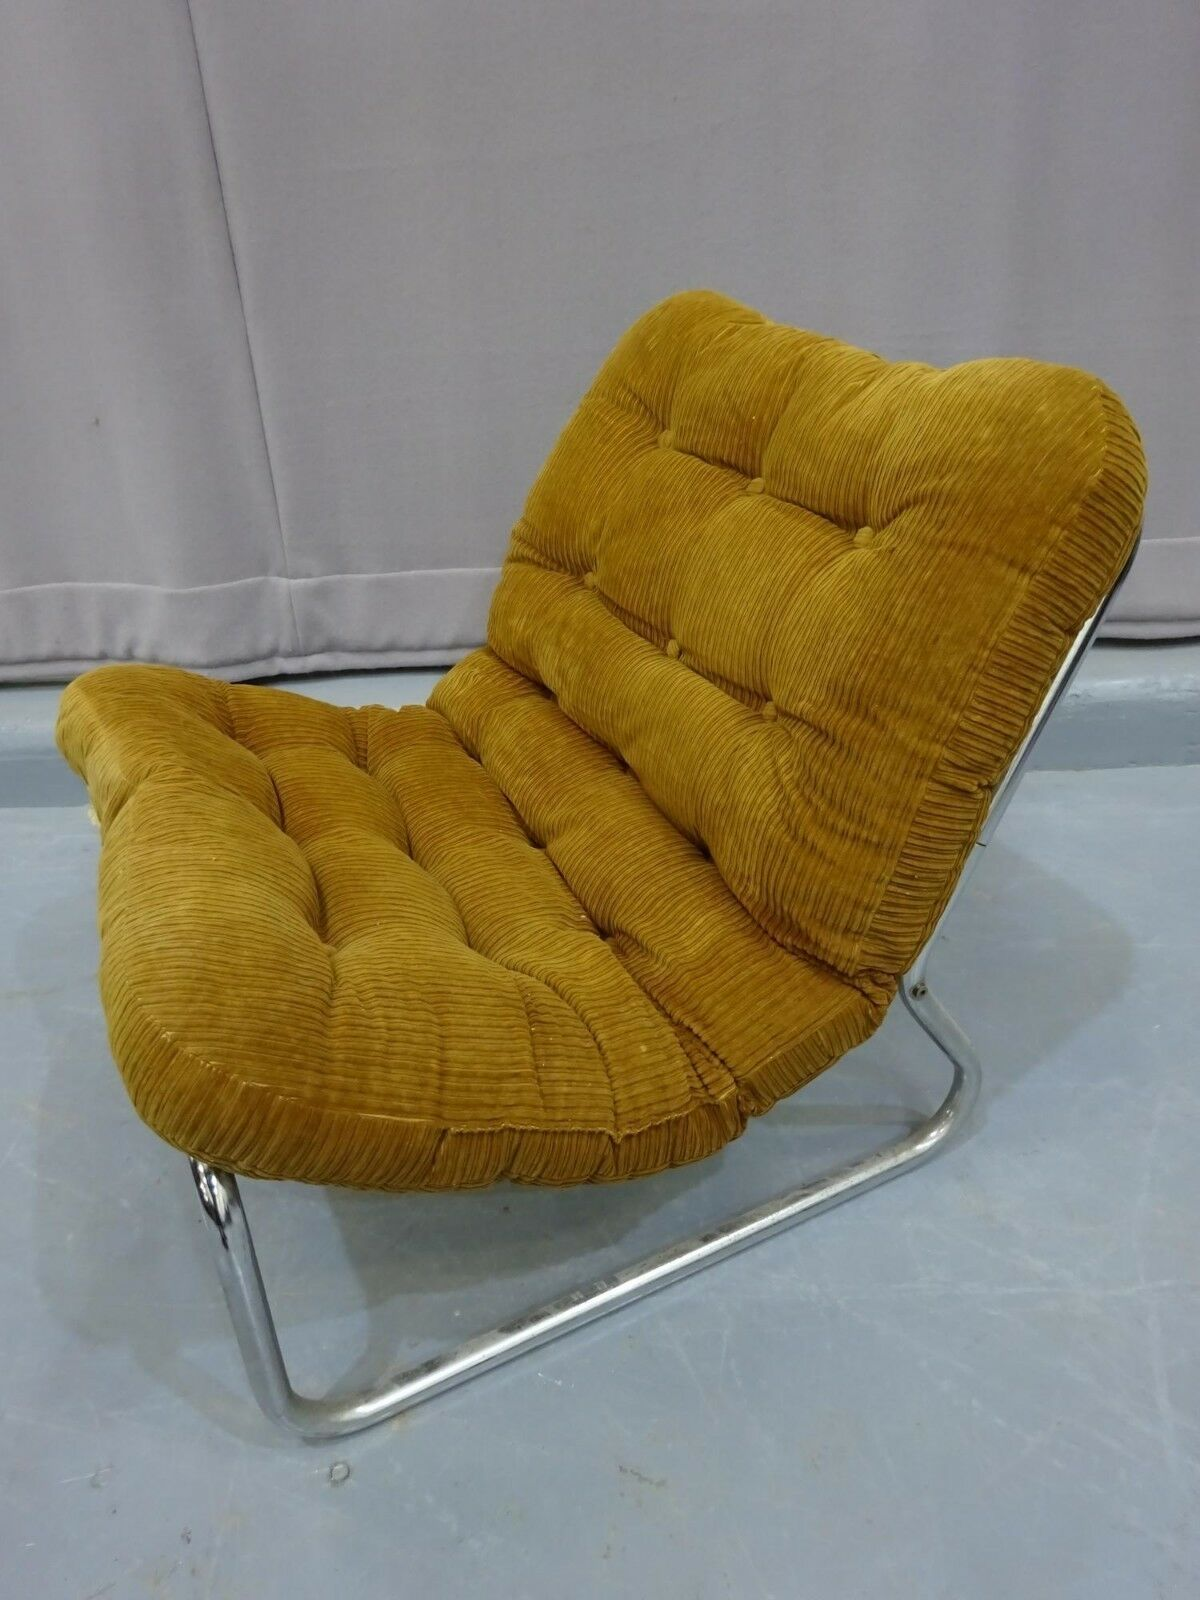 Fabulous 1970 S Peter Hoyte Style Sling Chair Retro Vintage Mid Evergreenethics Interior Chair Design Evergreenethicsorg